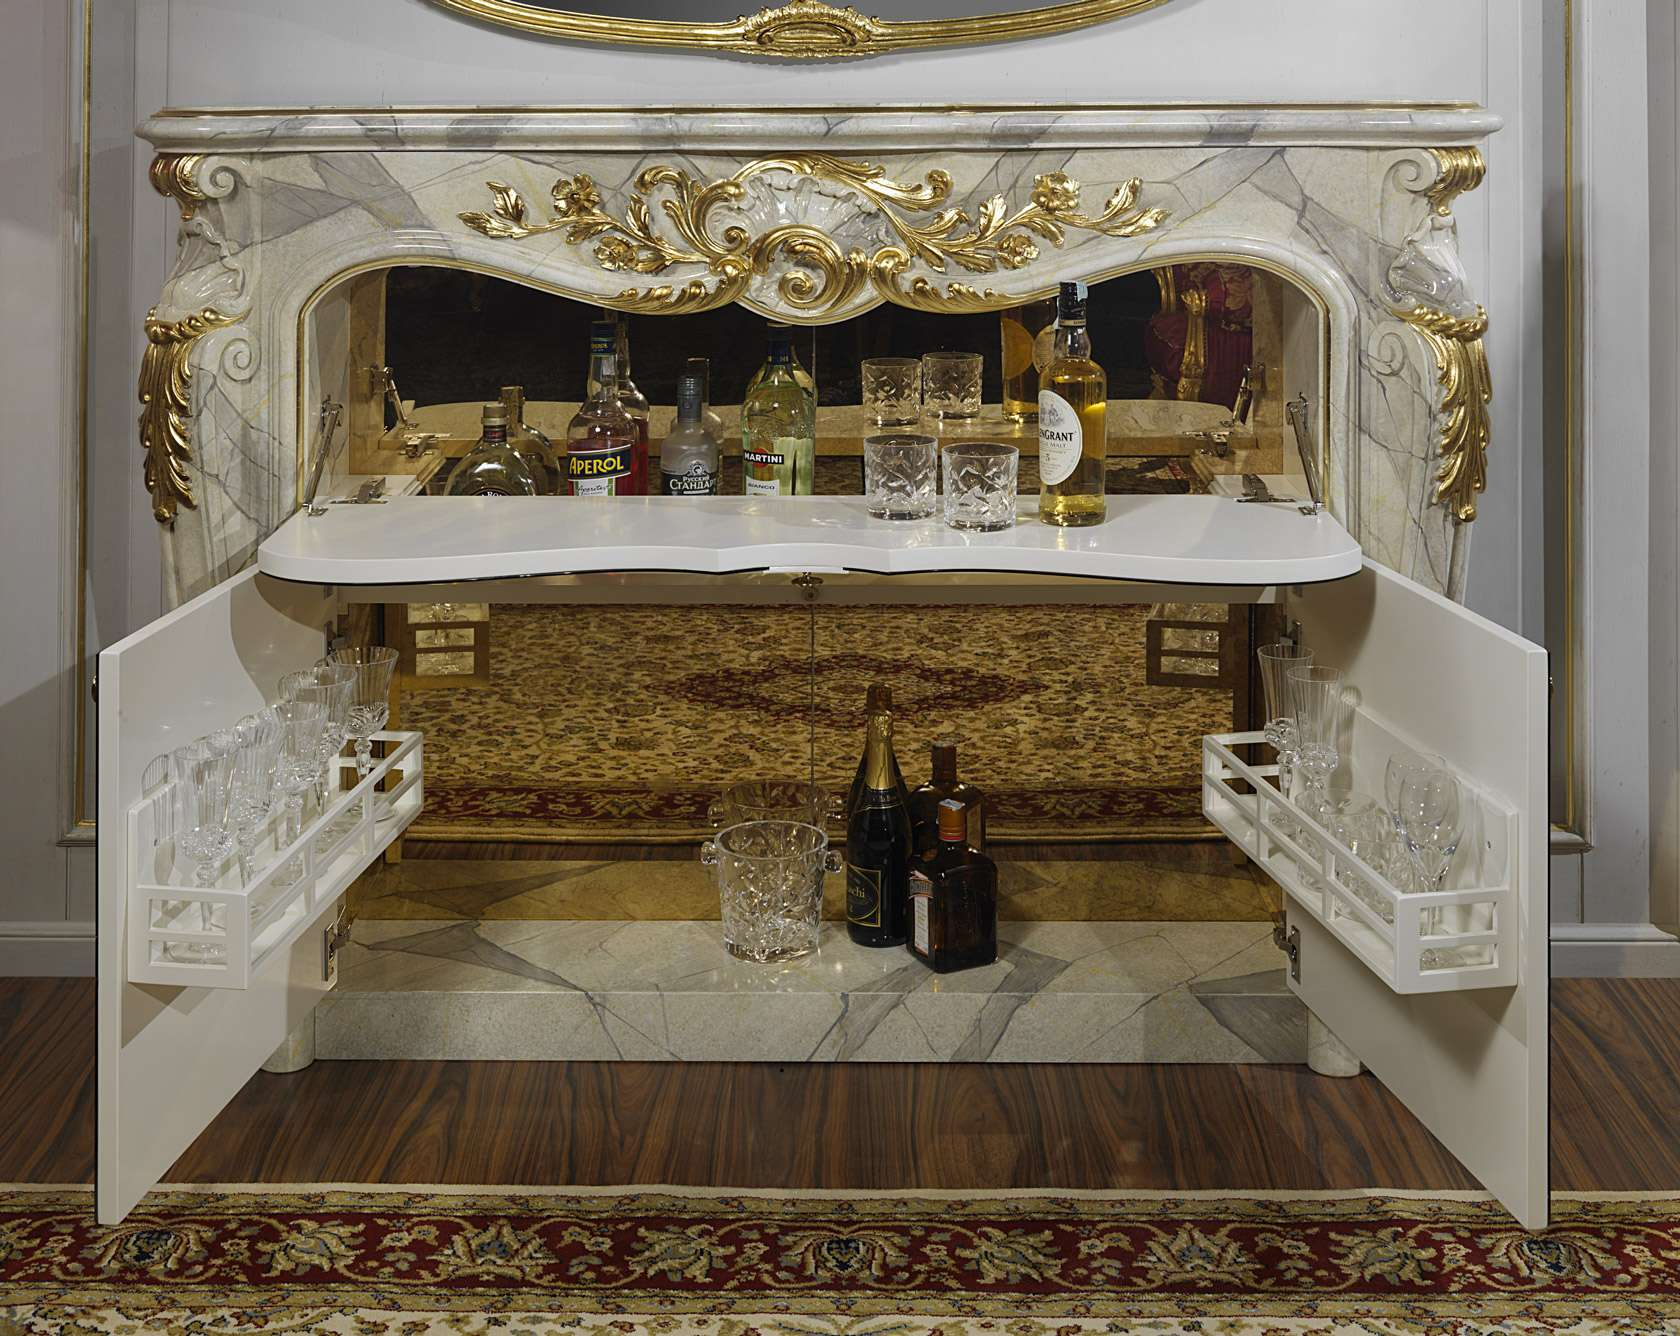 Camino con mobile bar stile barocco | Vimercati Meda